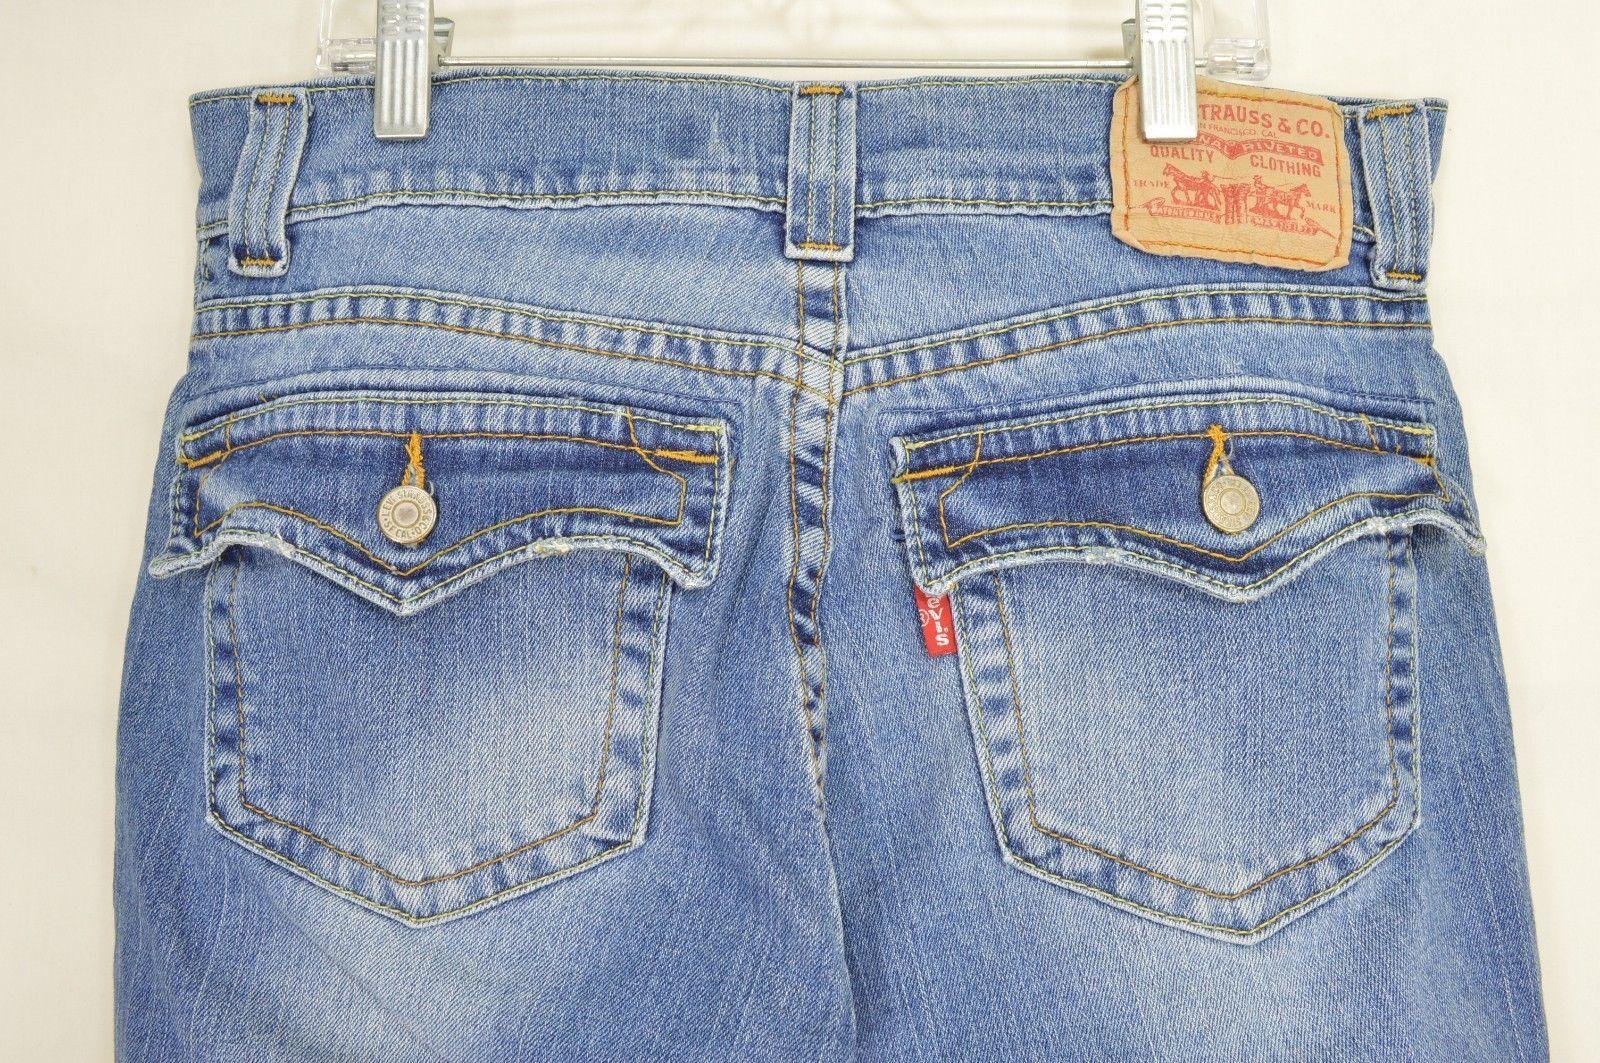 Levi 542 jeans slouch 10 x 31 flare twisted leg flap back pockets boho hippie